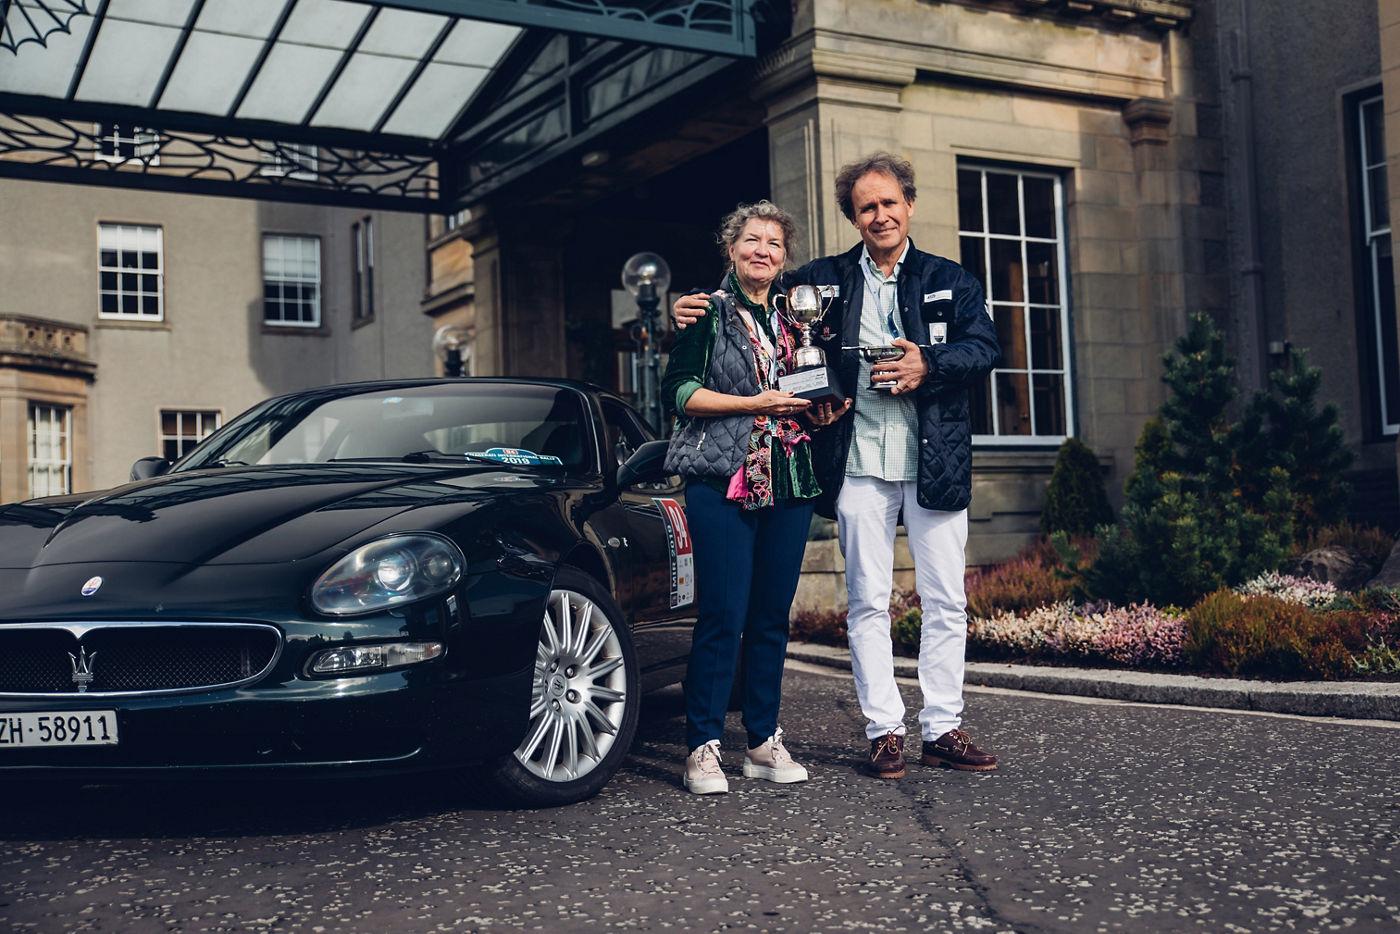 Maserati International Rally 2019 - Gleneagles Hotel Winners of the Peter Martin Trophy